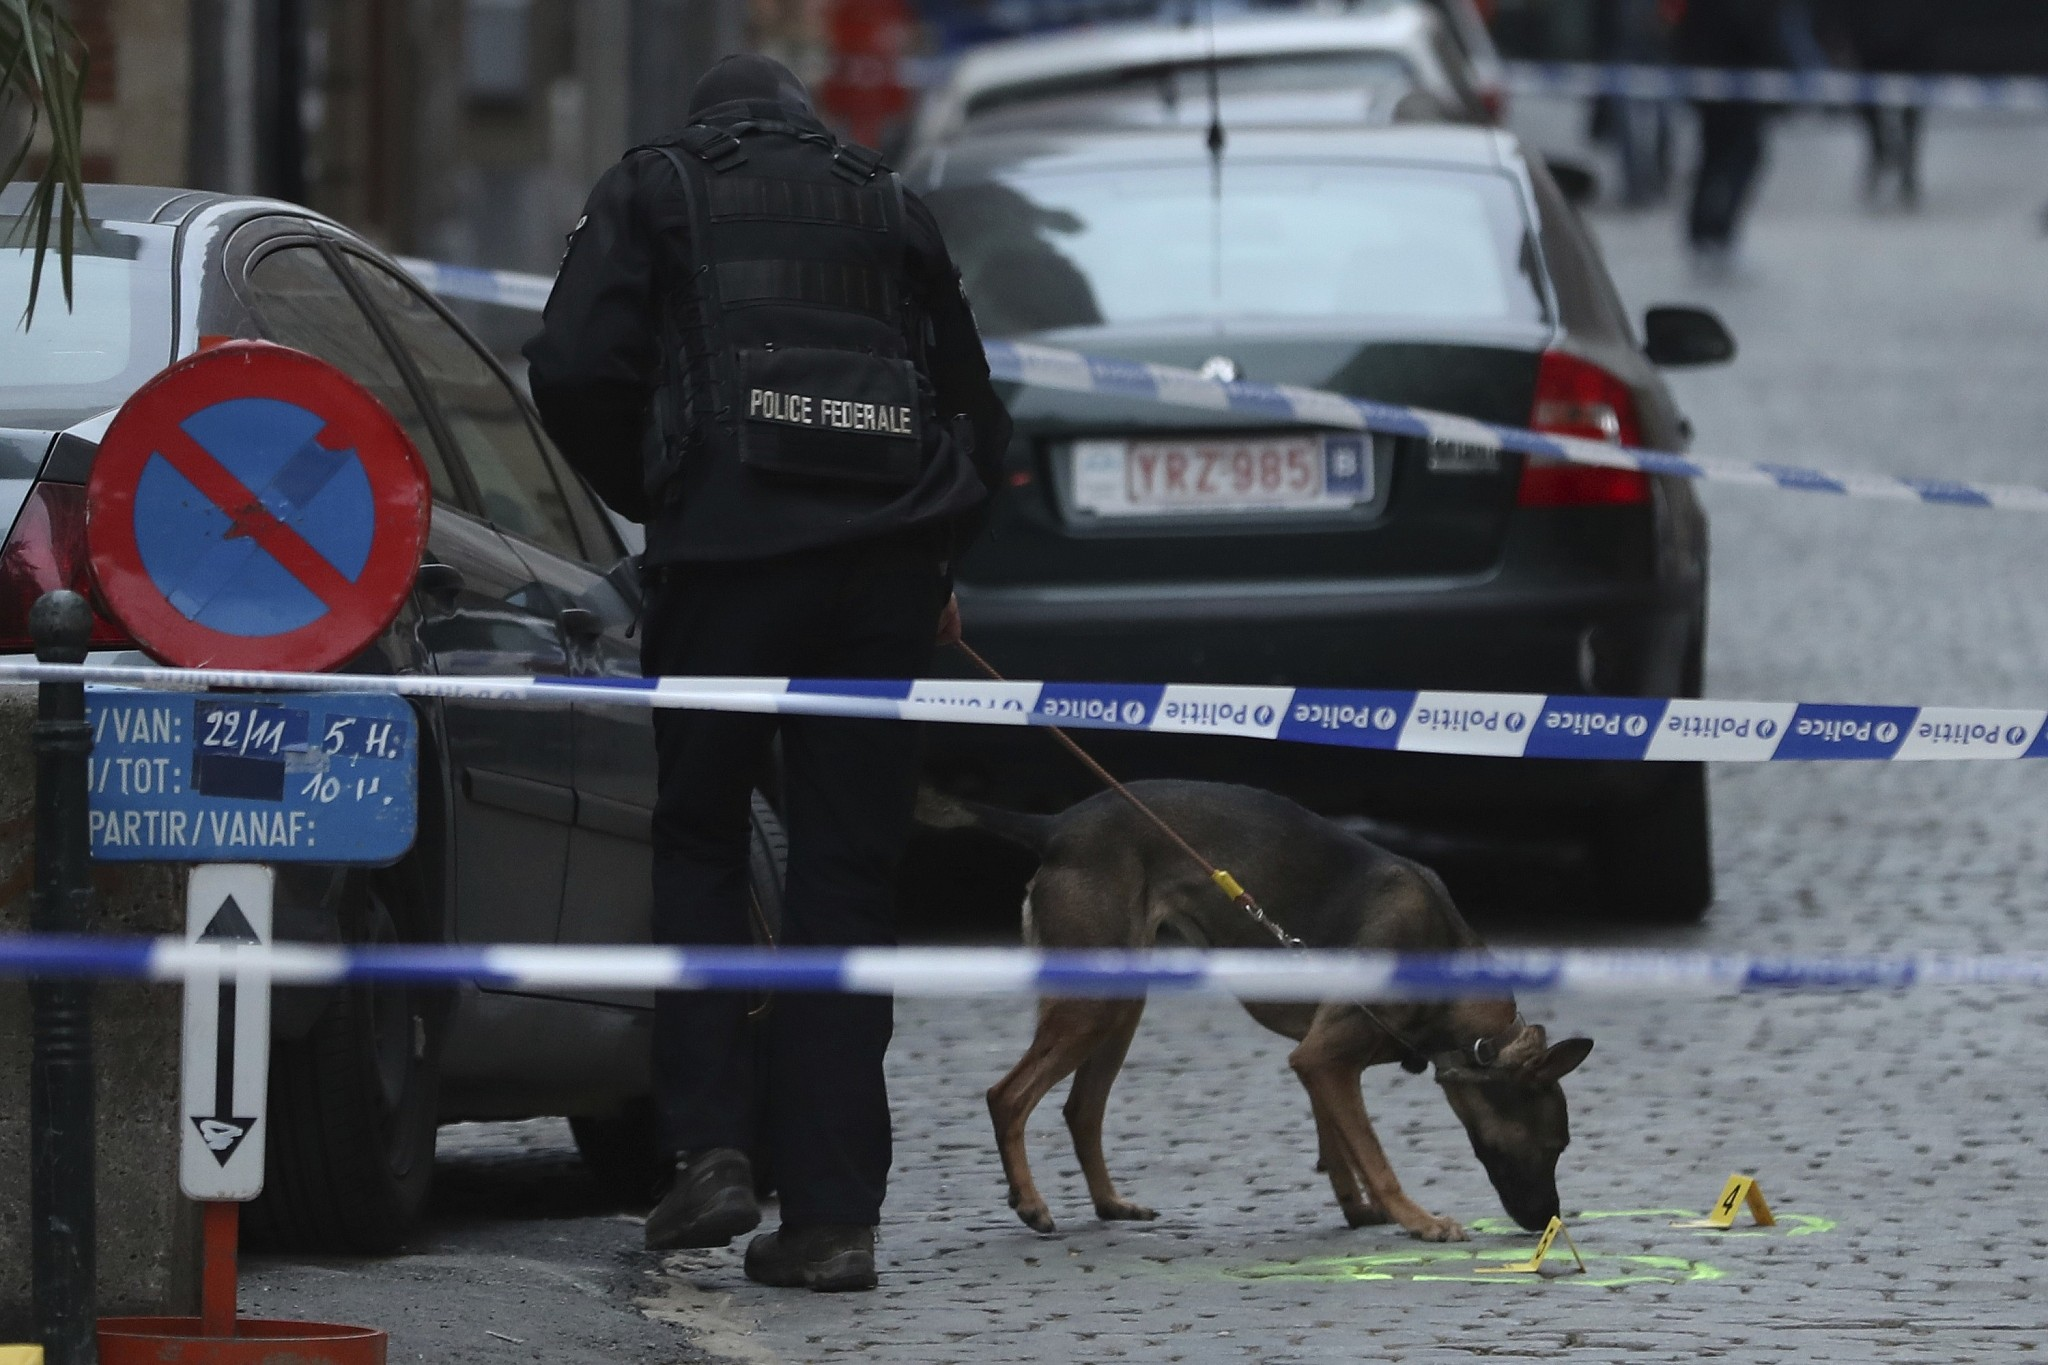 Police officer injured in Brussels knife attack